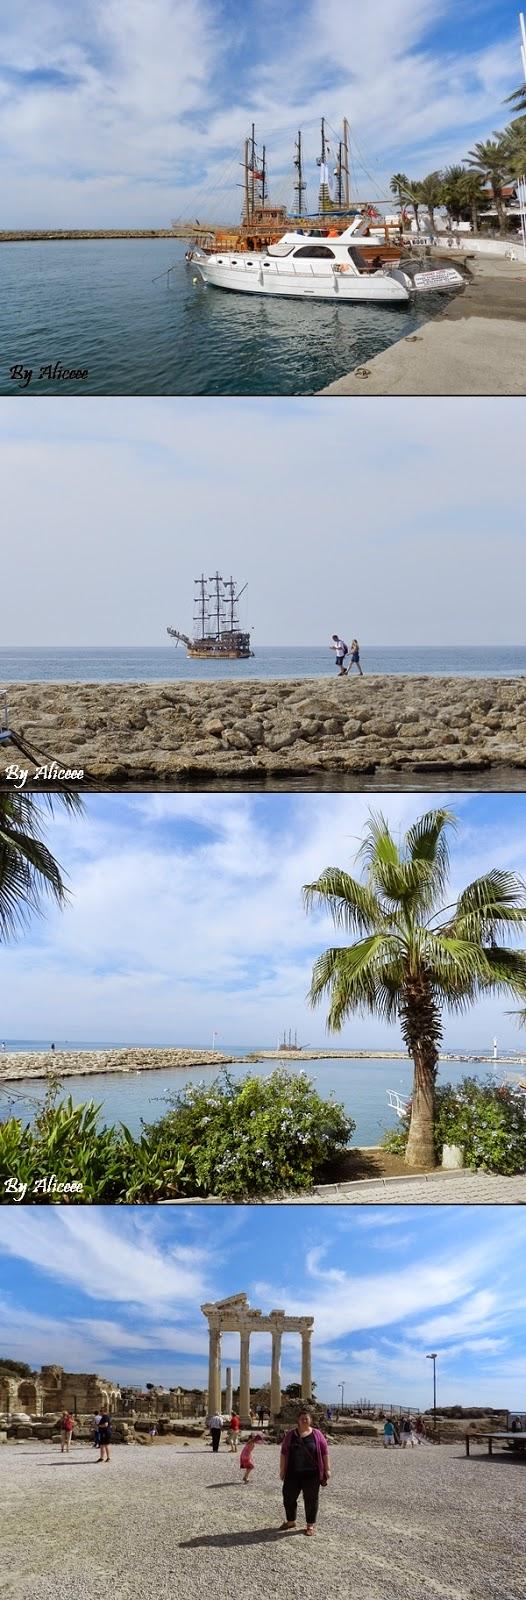 side-statiune-mare-litoral-turcia